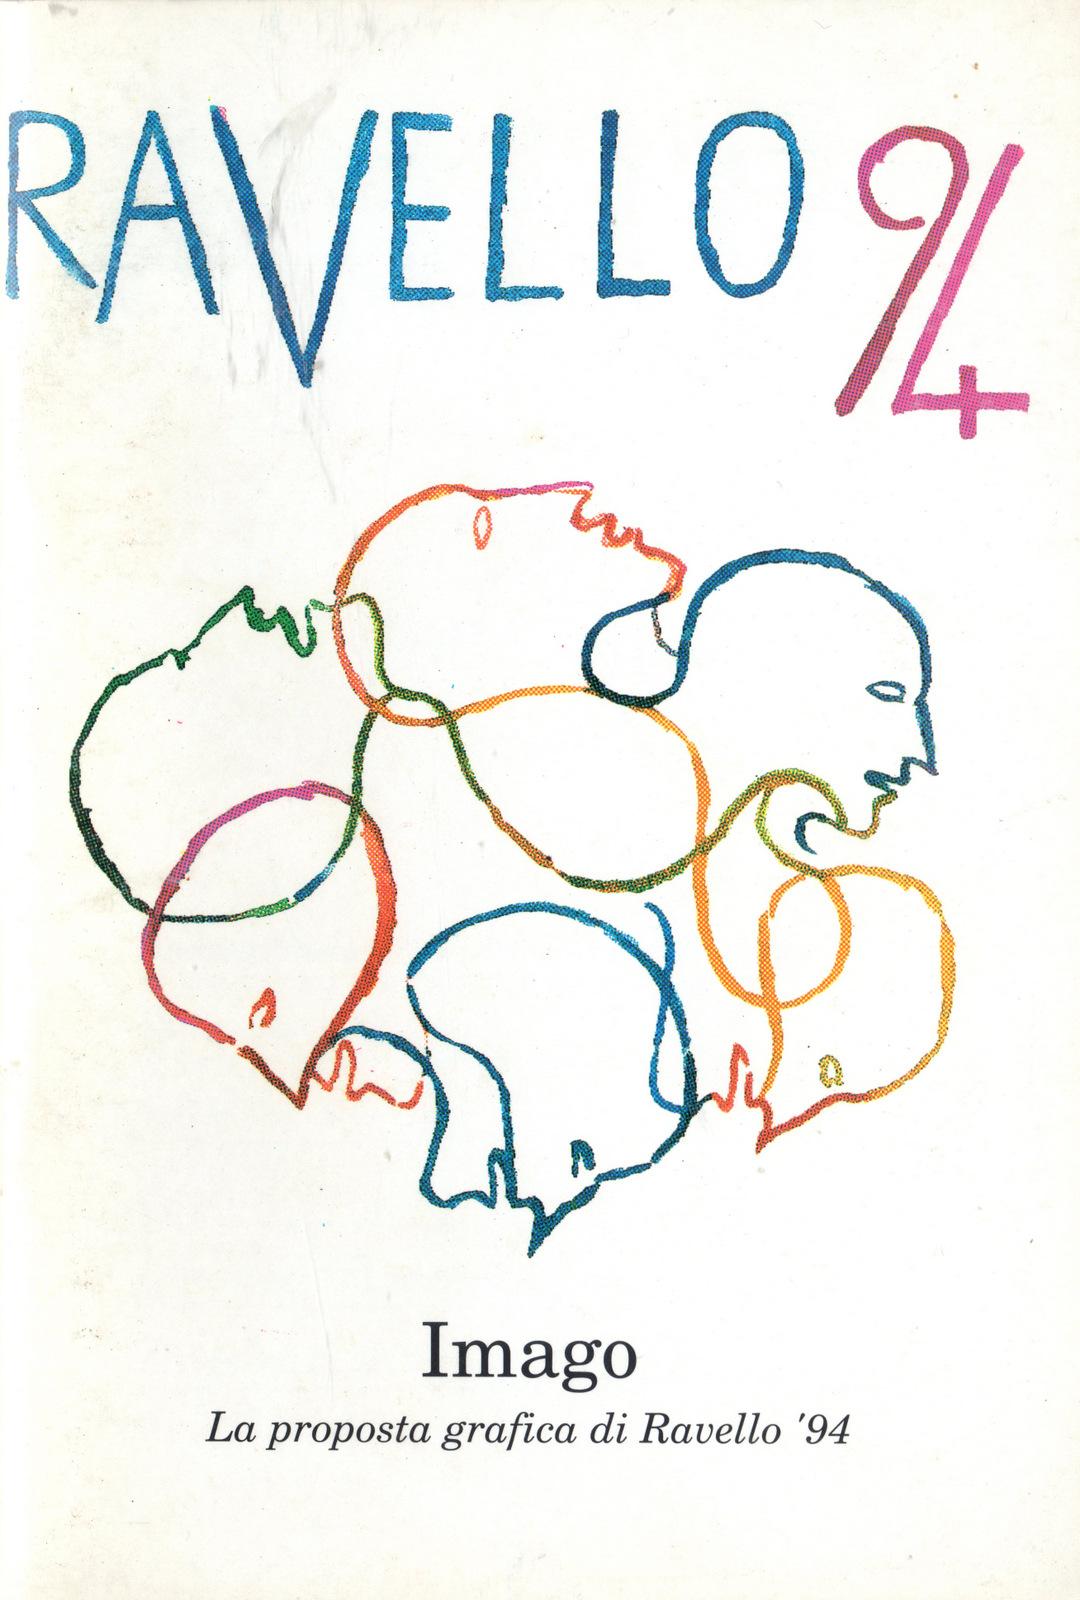 Manifesto Ravello 1994